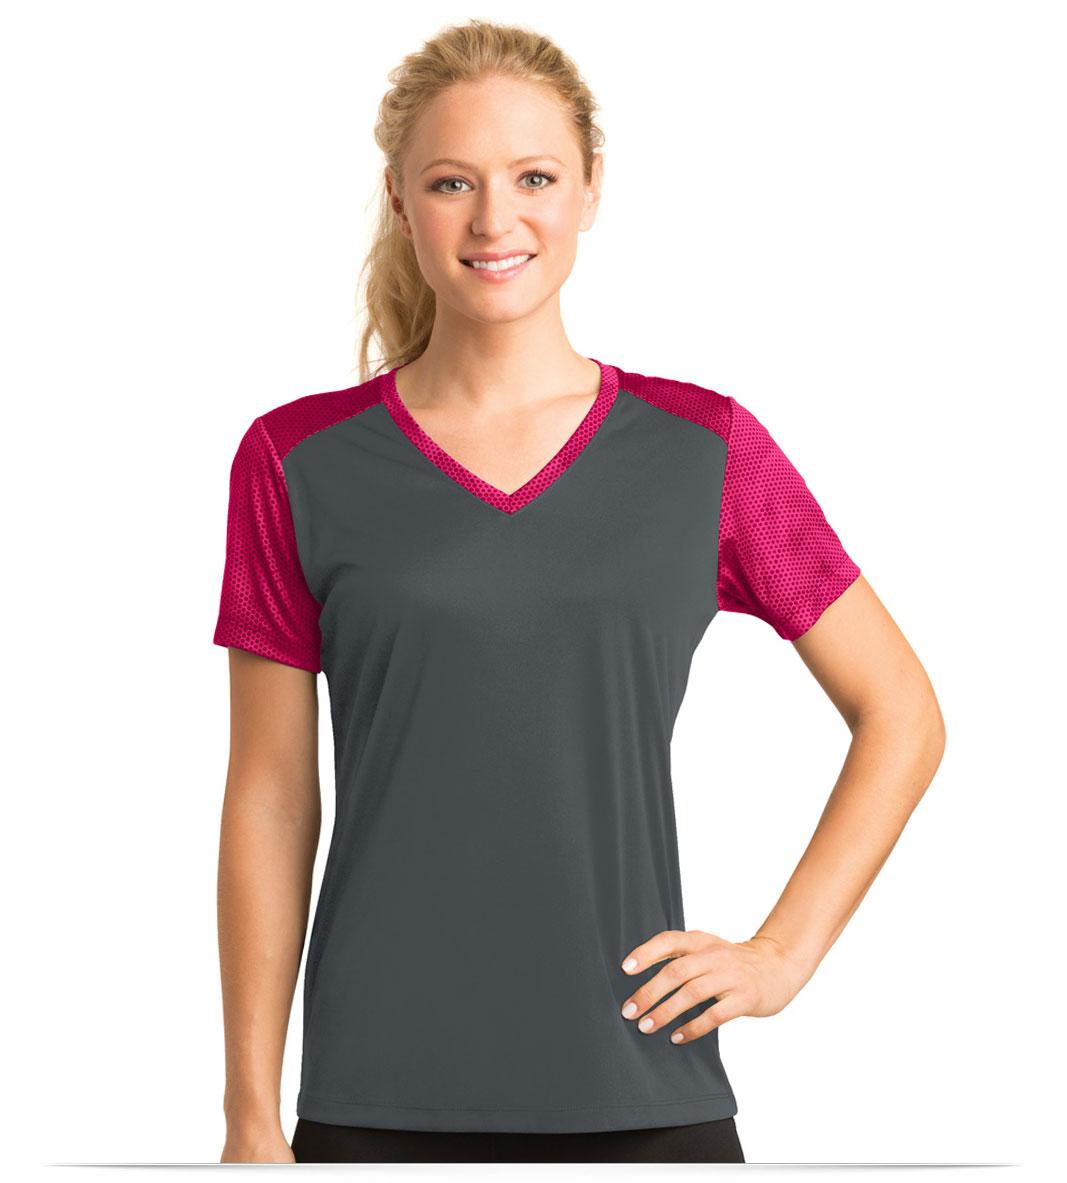 Customize Sport-Tek Ladies Colorblock V-Neck Tee